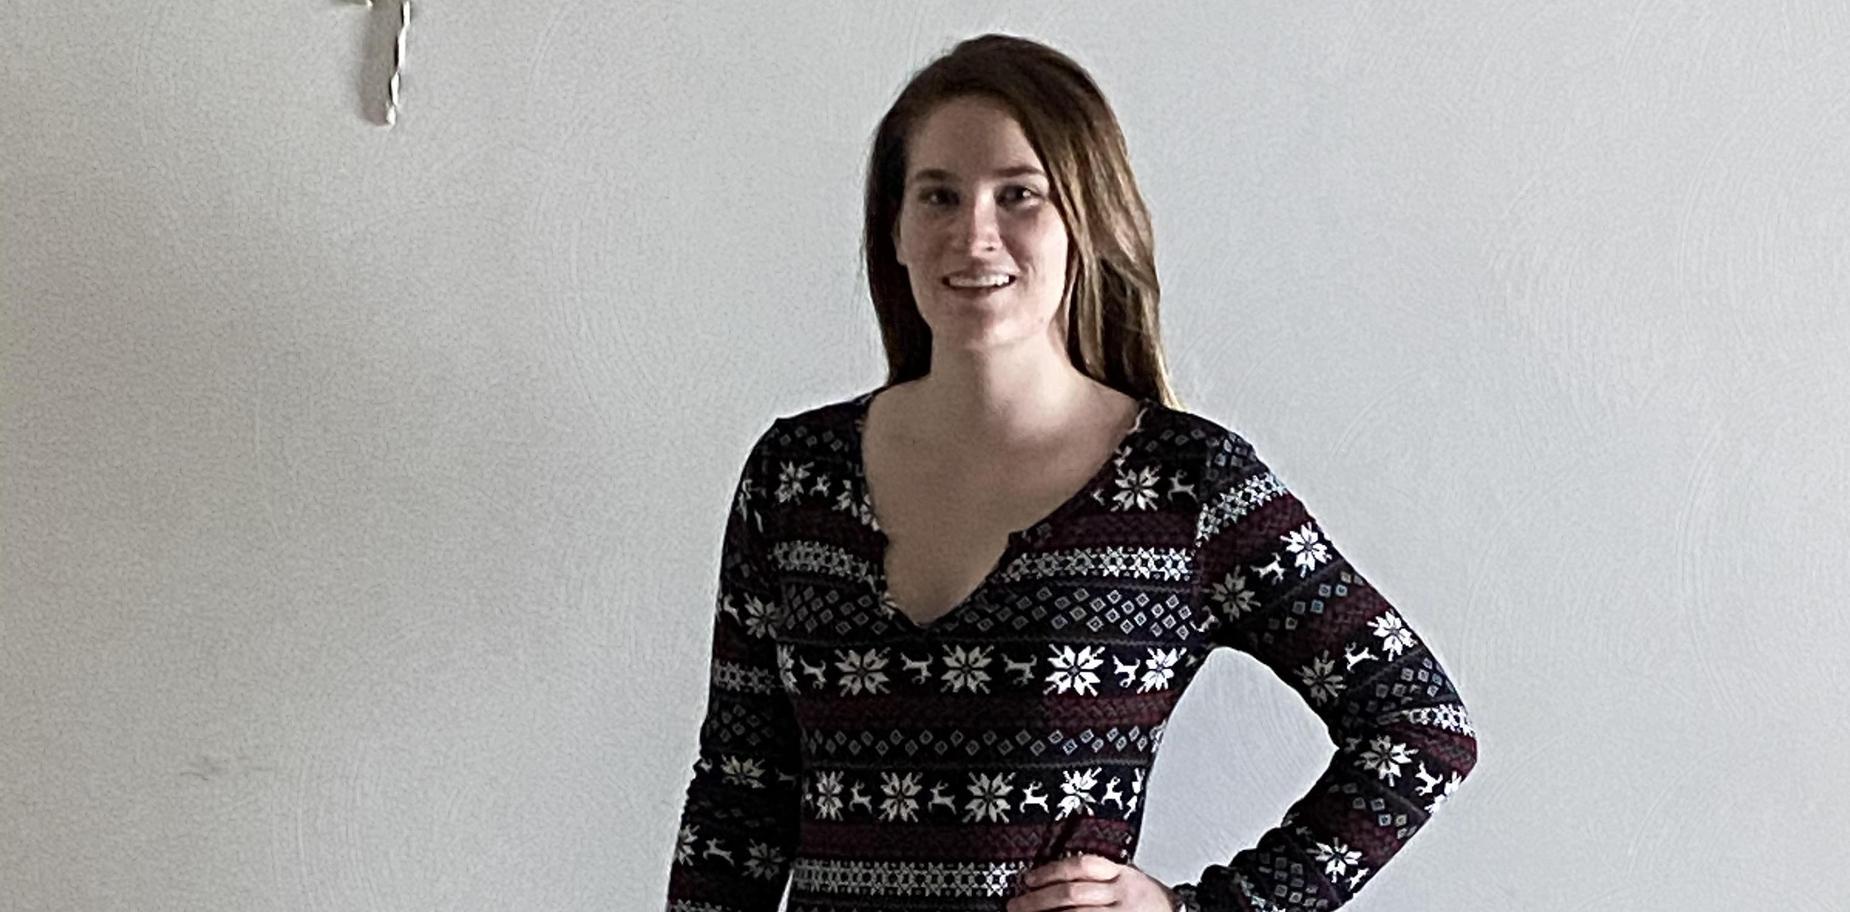 girl in holiday attire